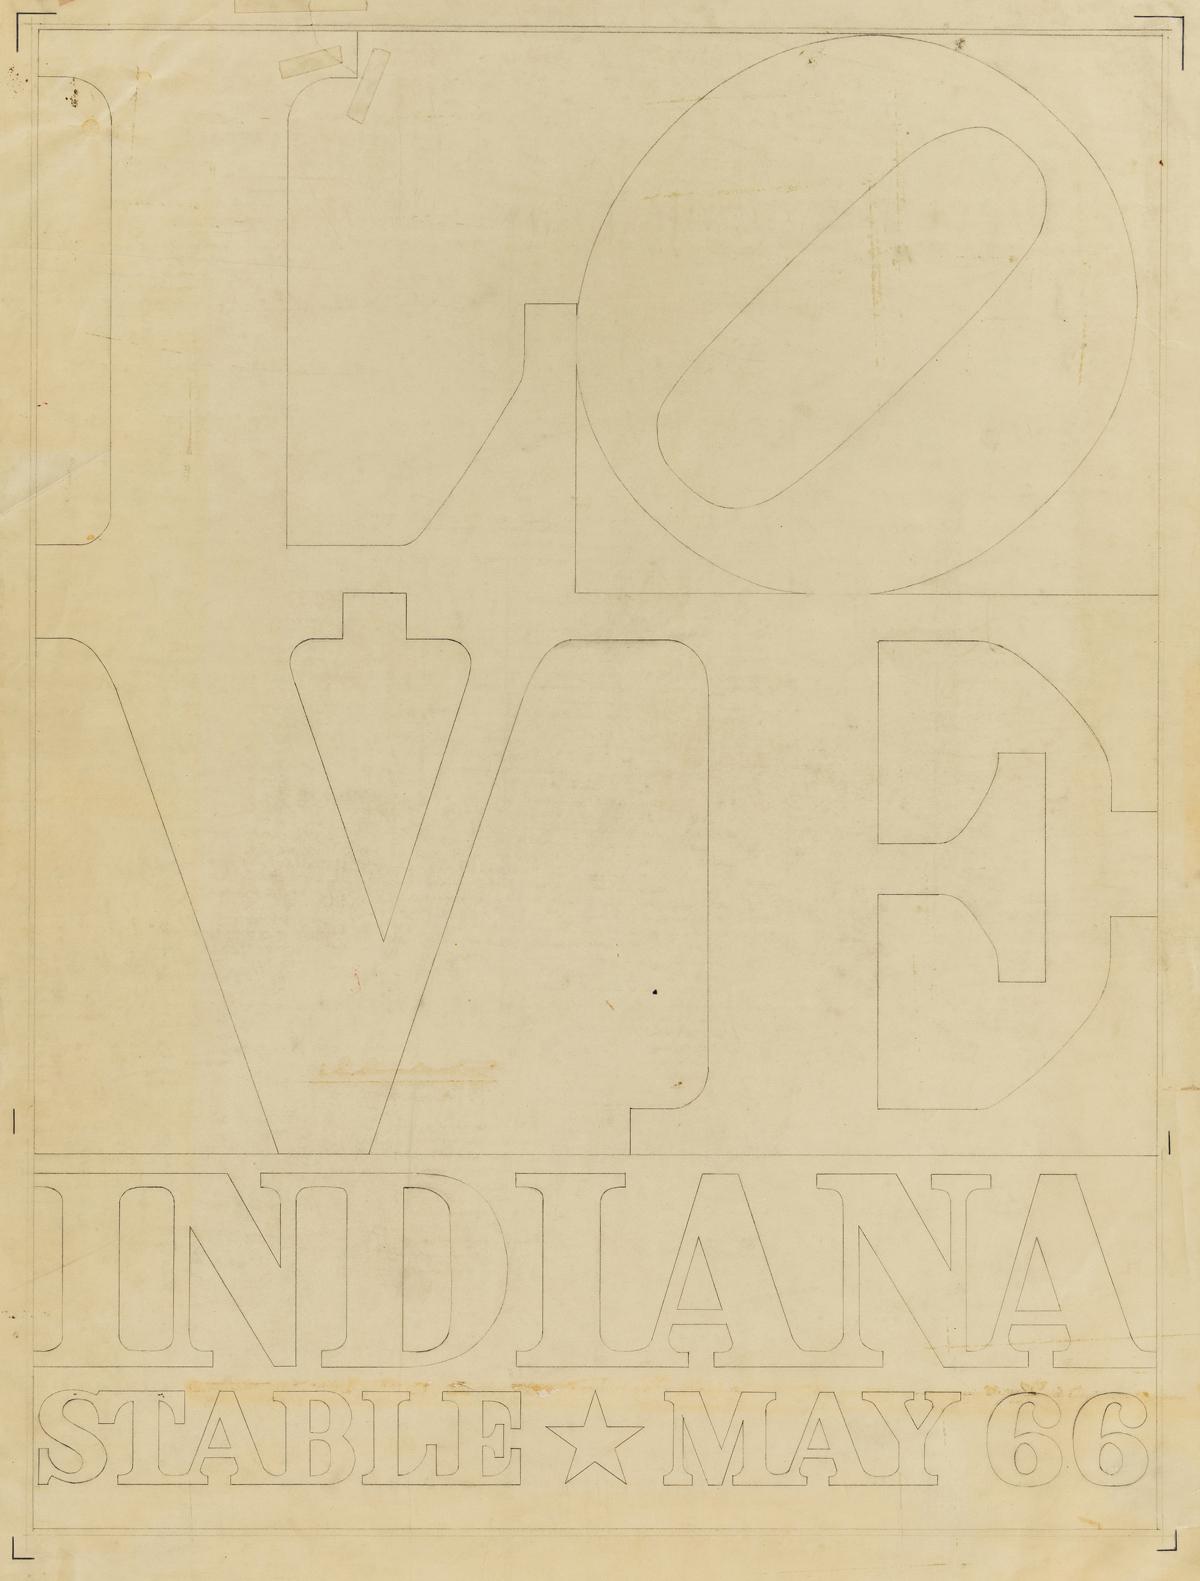 ROBERT INDIANA LOVE, Indiana Stable May 66.